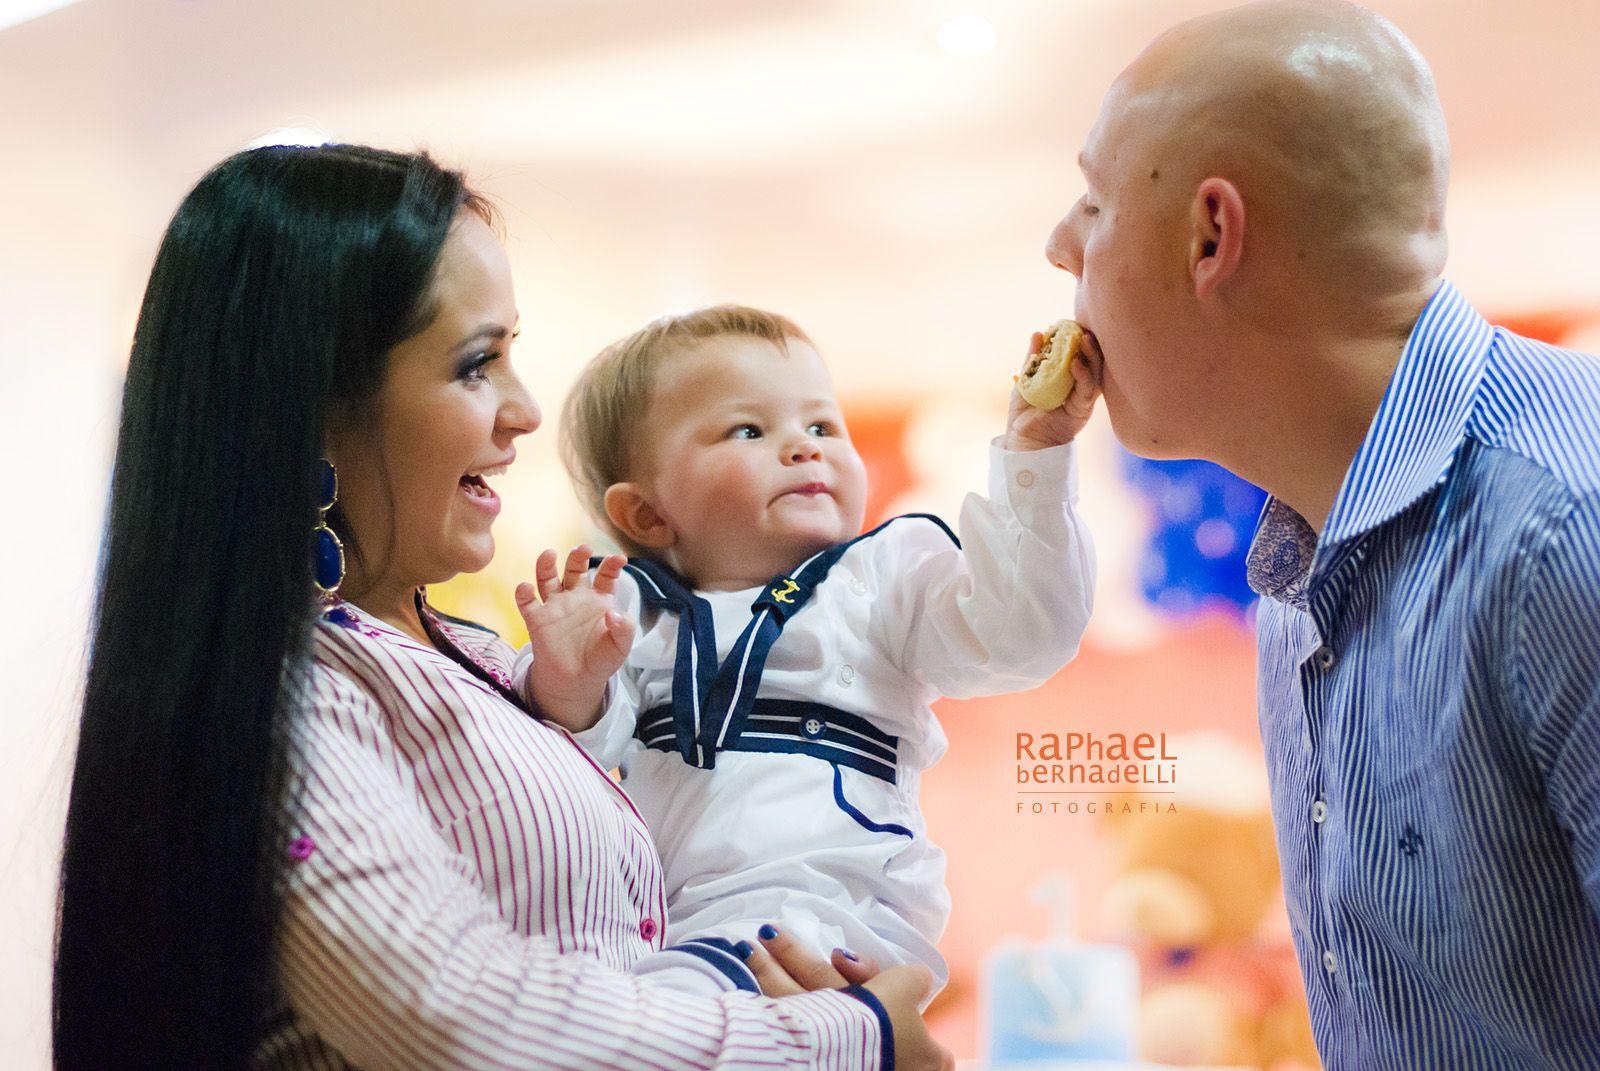 Come tudo, tá papai?! #festasinfantis #marinheiro #aniversário #parabens #happybirthday